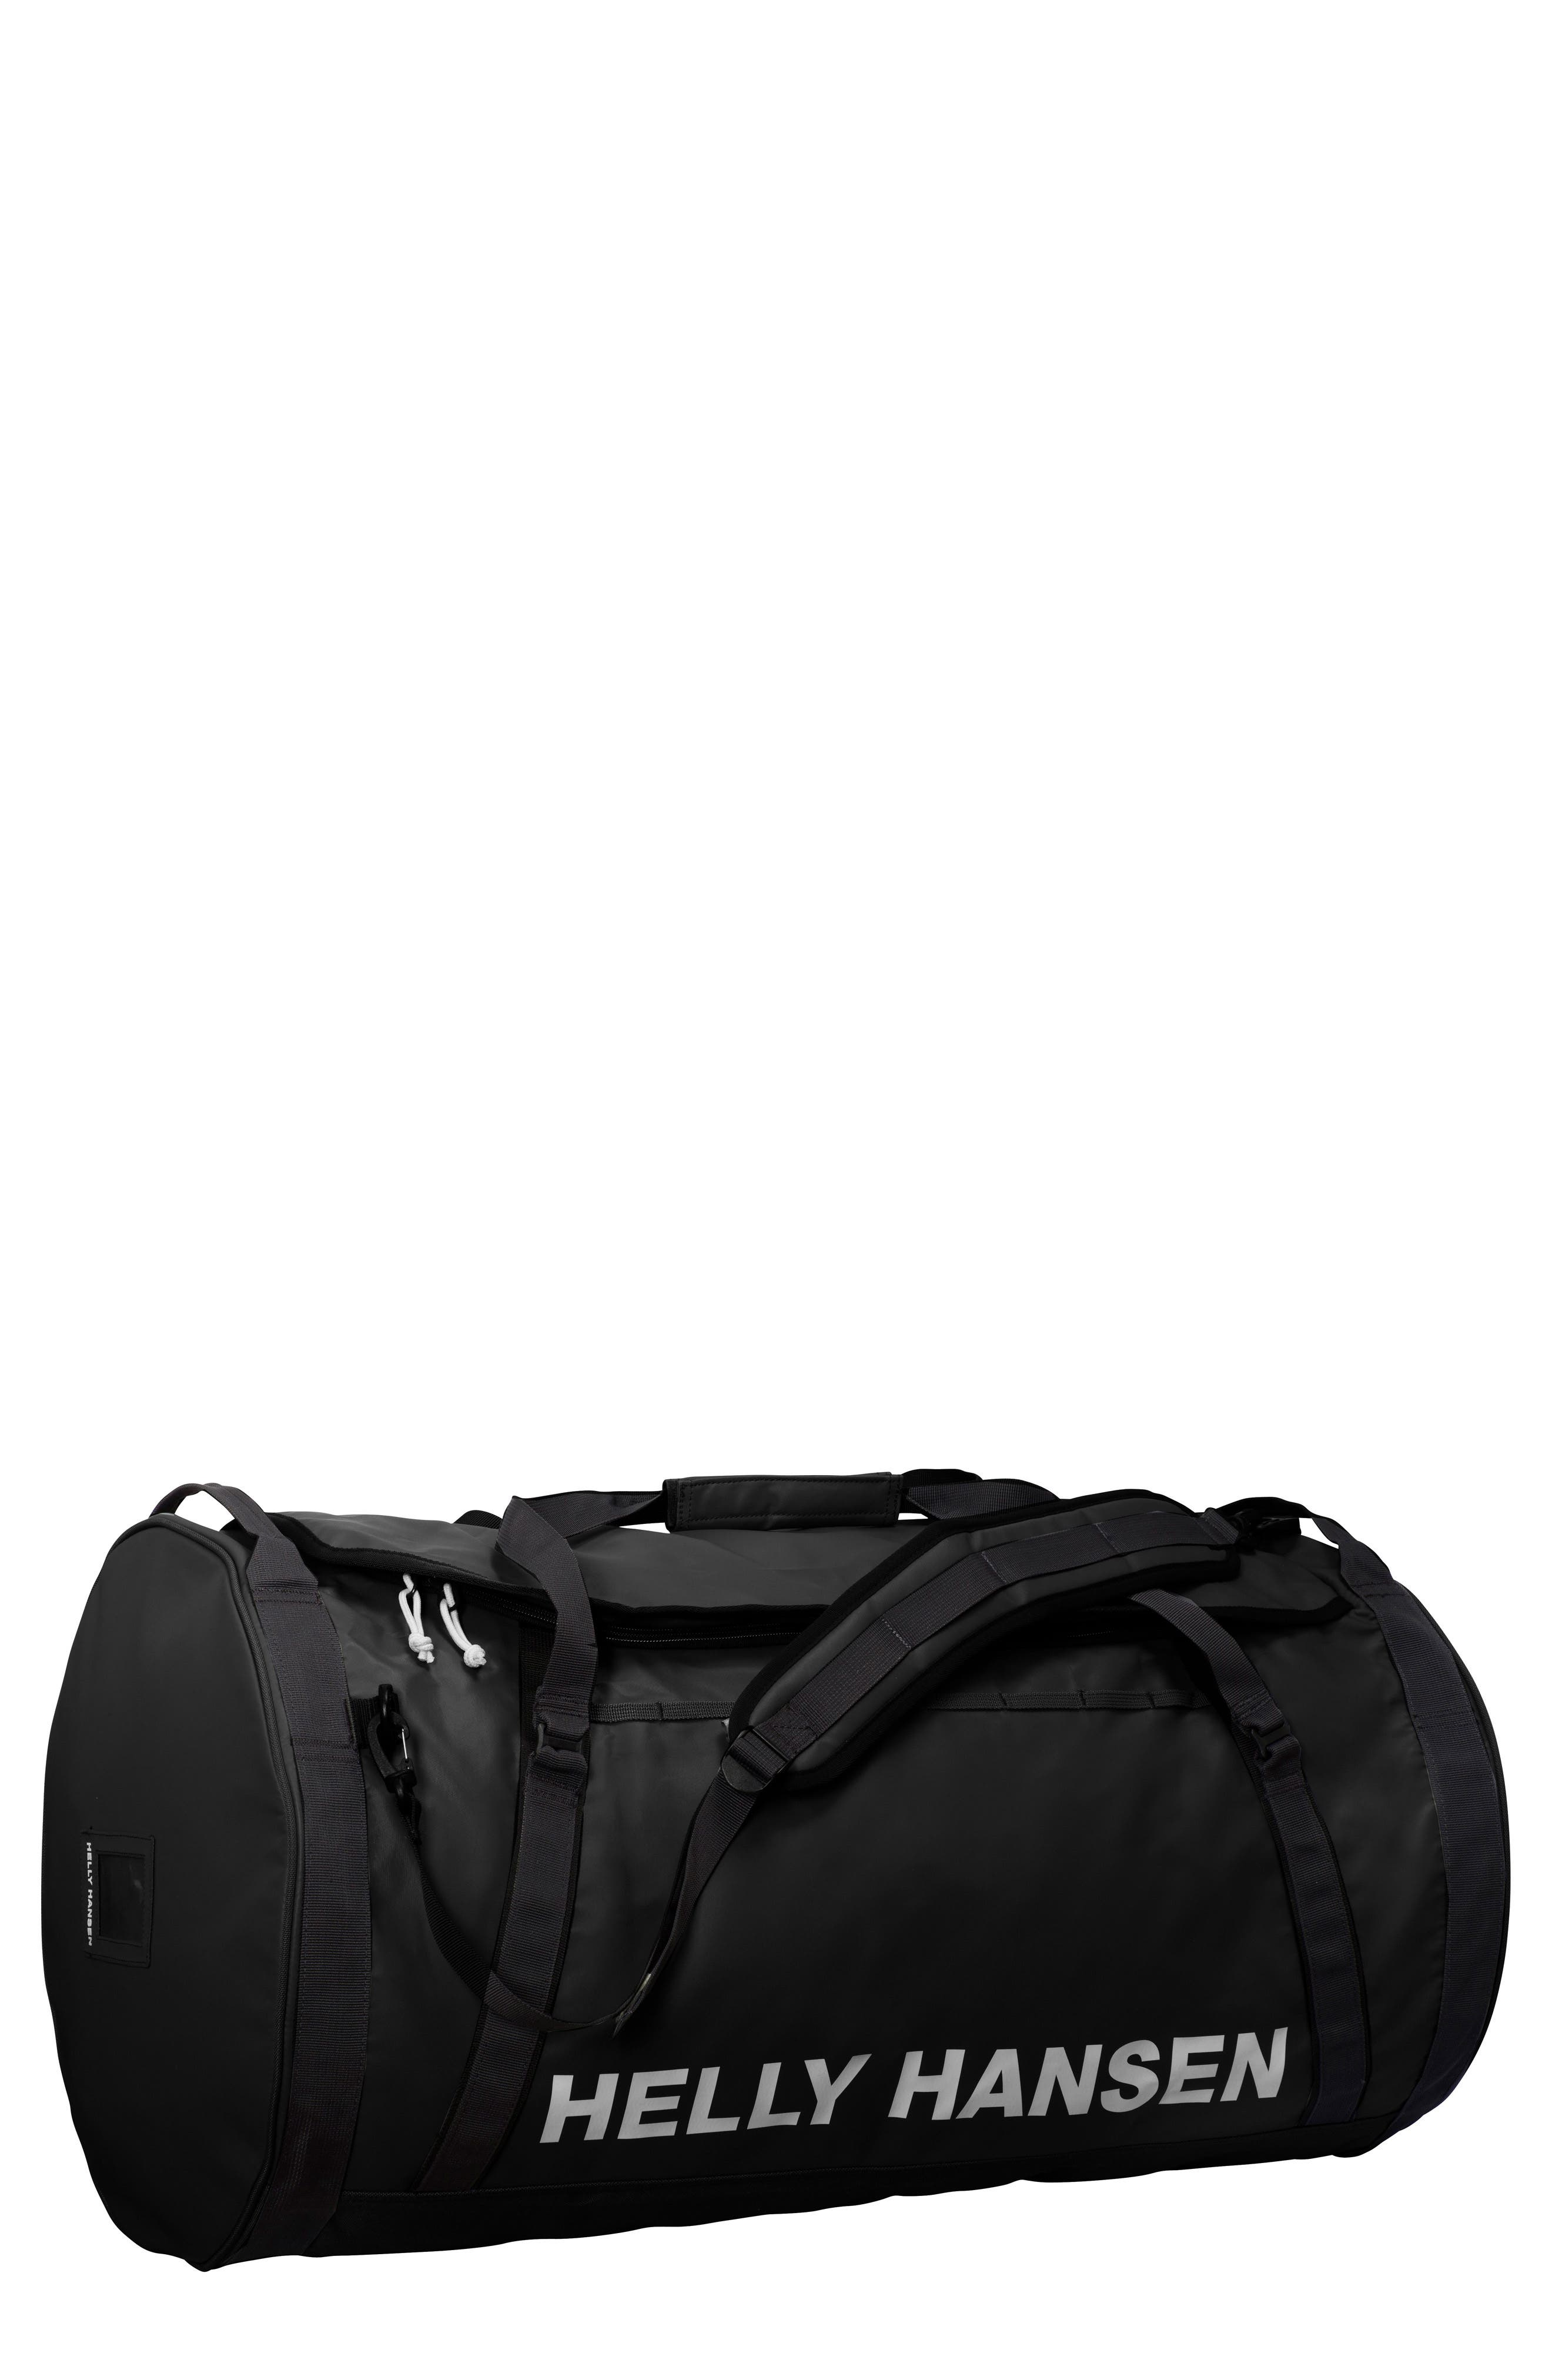 Helly Hansen 30-Liter Duffel Bag - Black